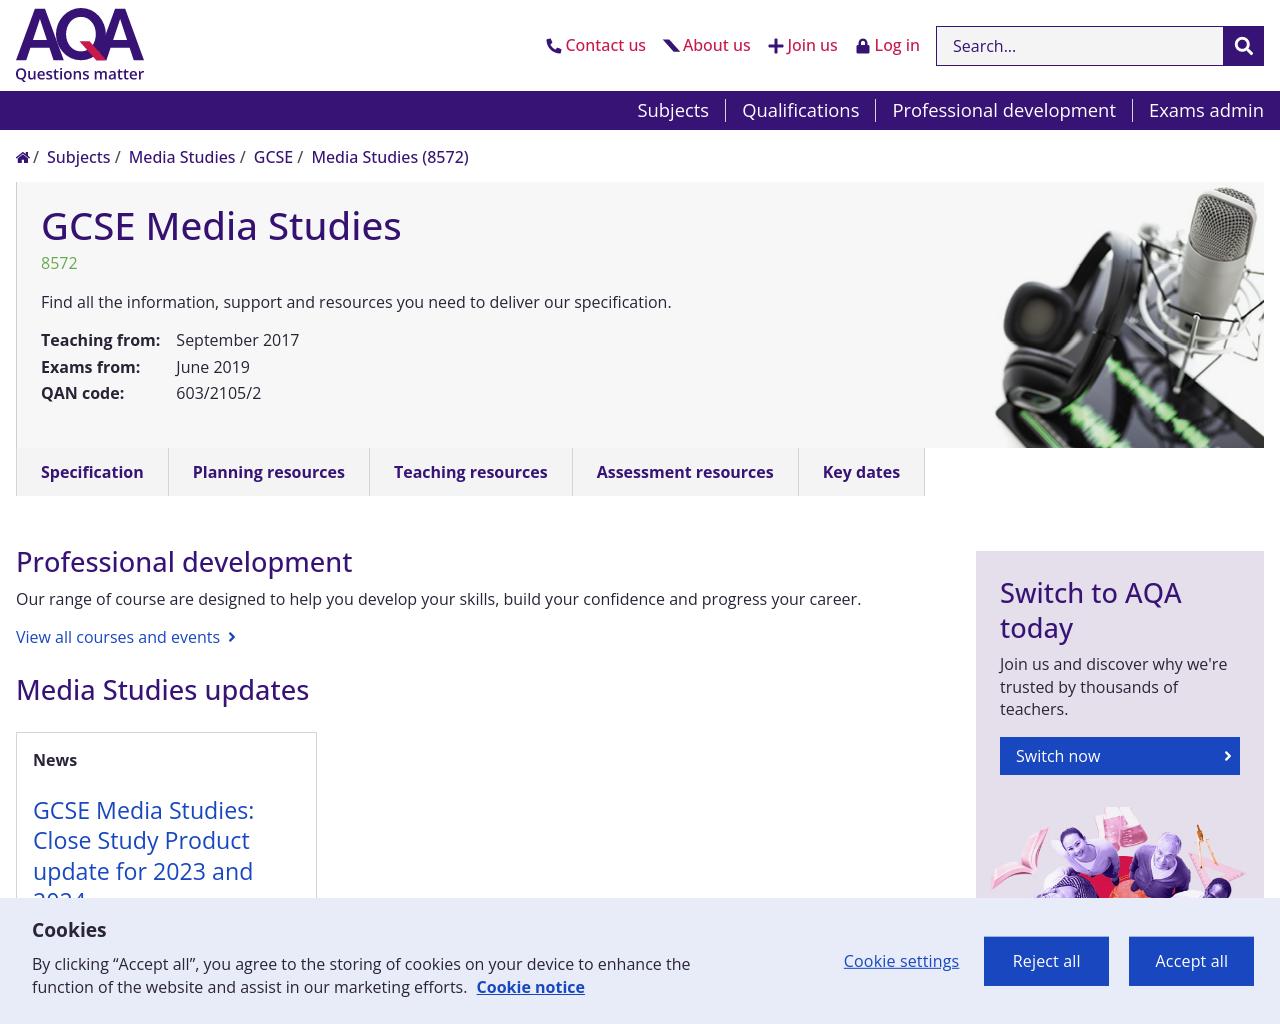 AQA GCSE Media Studies Specification